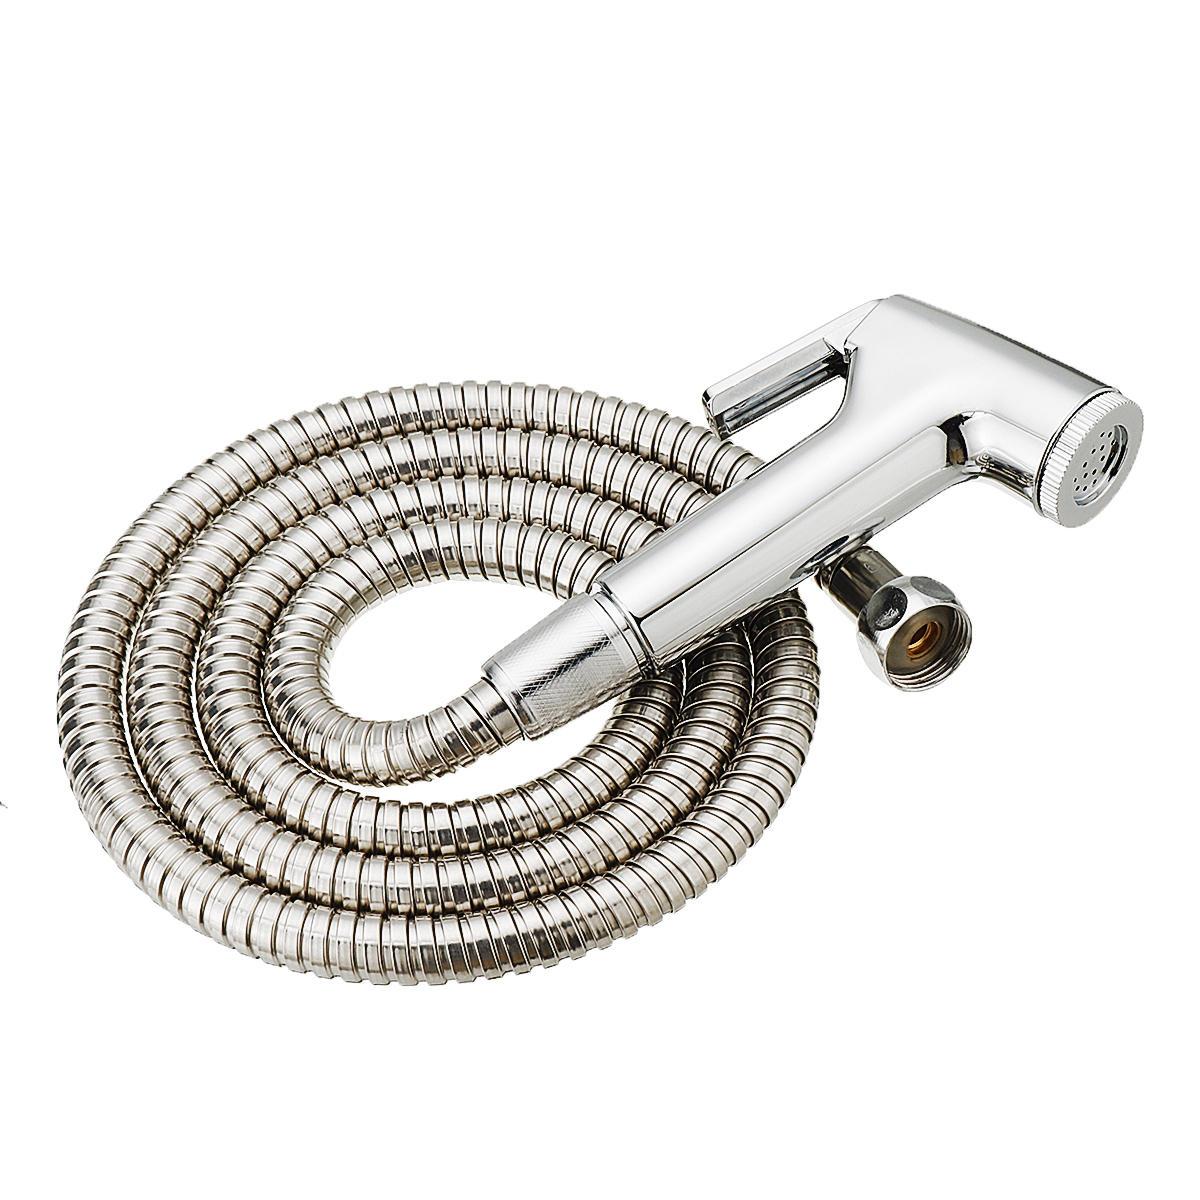 ABS Bathroom Portable Bidet Sprayer Handhold Toilet Bidet Shower Head Sprayer for Personal Hygiene w/ 1.5m Stainless Steel Hose